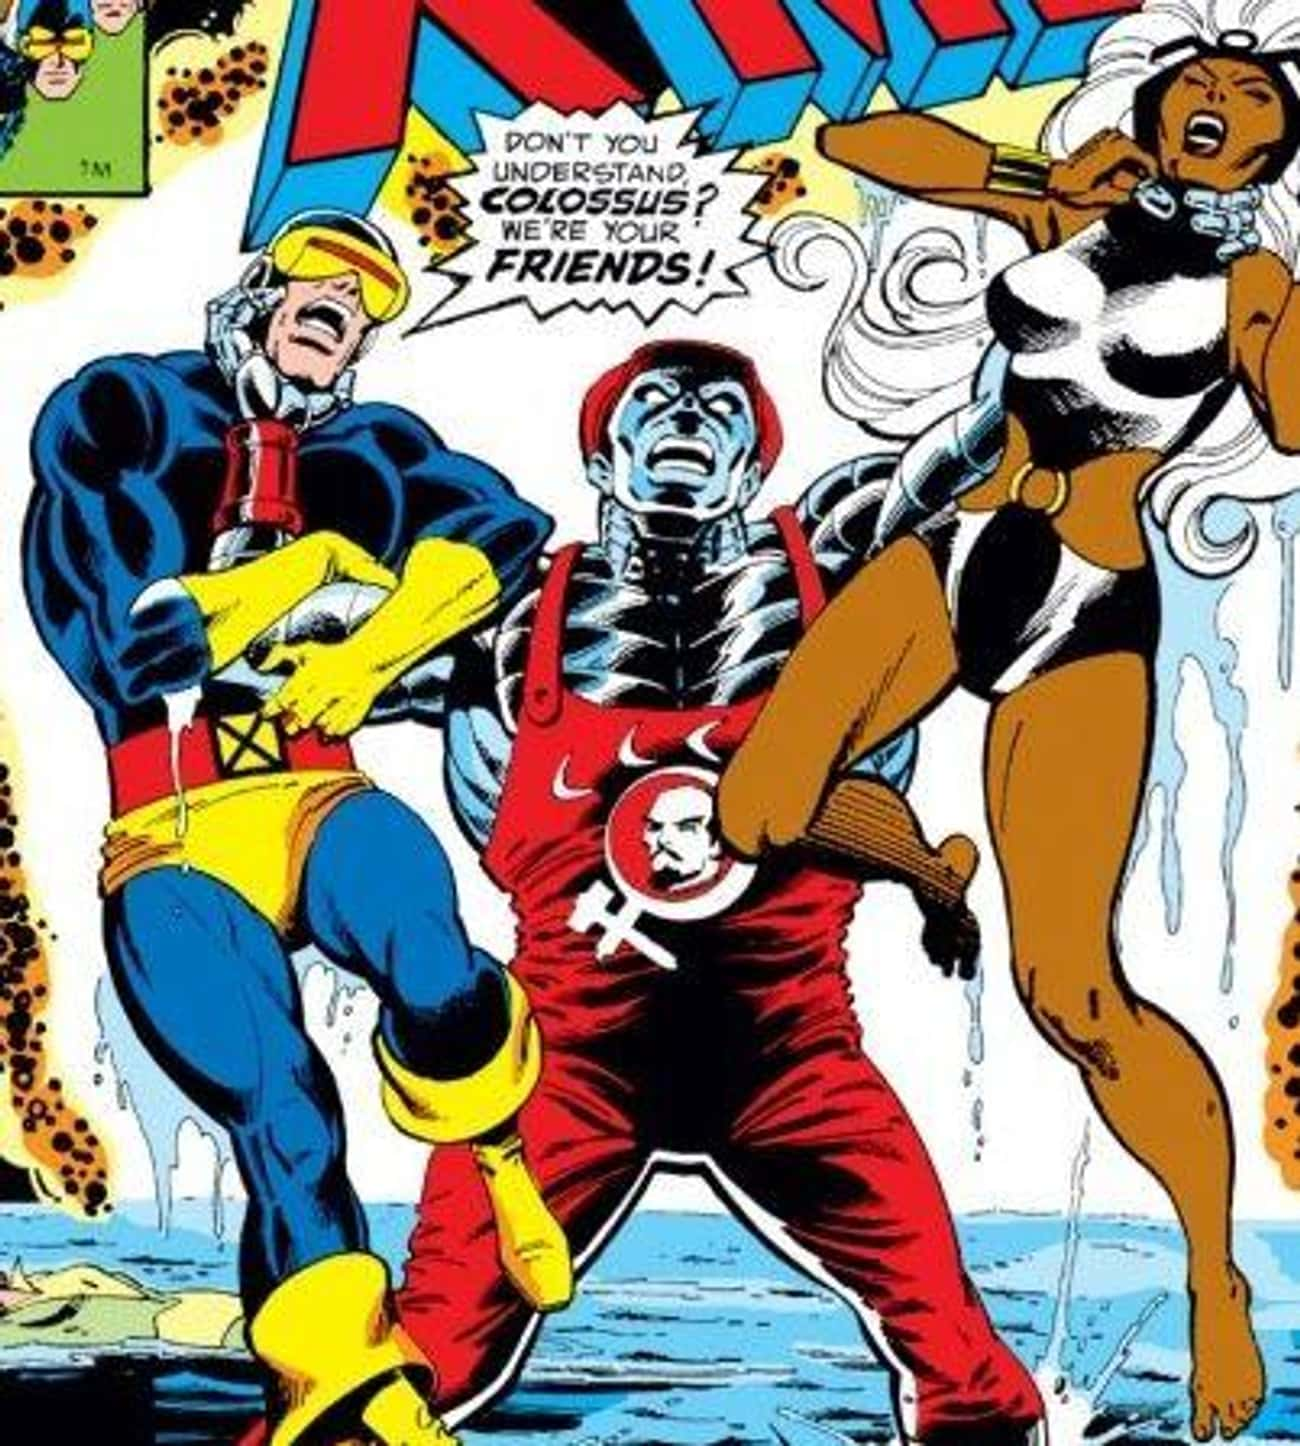 Colossus (Marvel Comics)